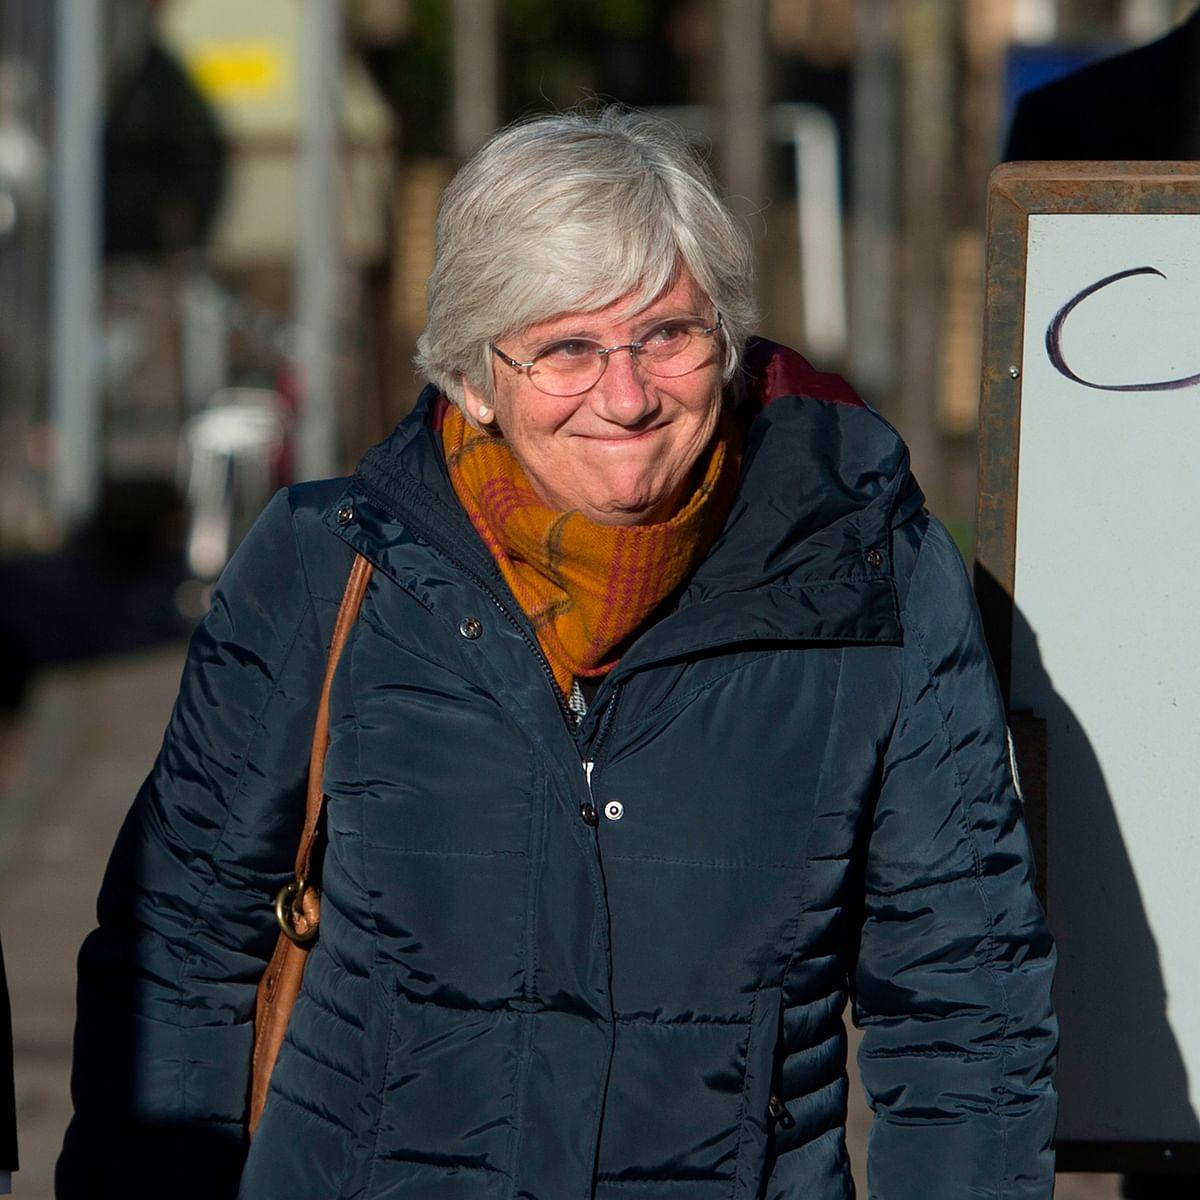 Catalan ex-minister Clara Ponsati arrested in Scotland